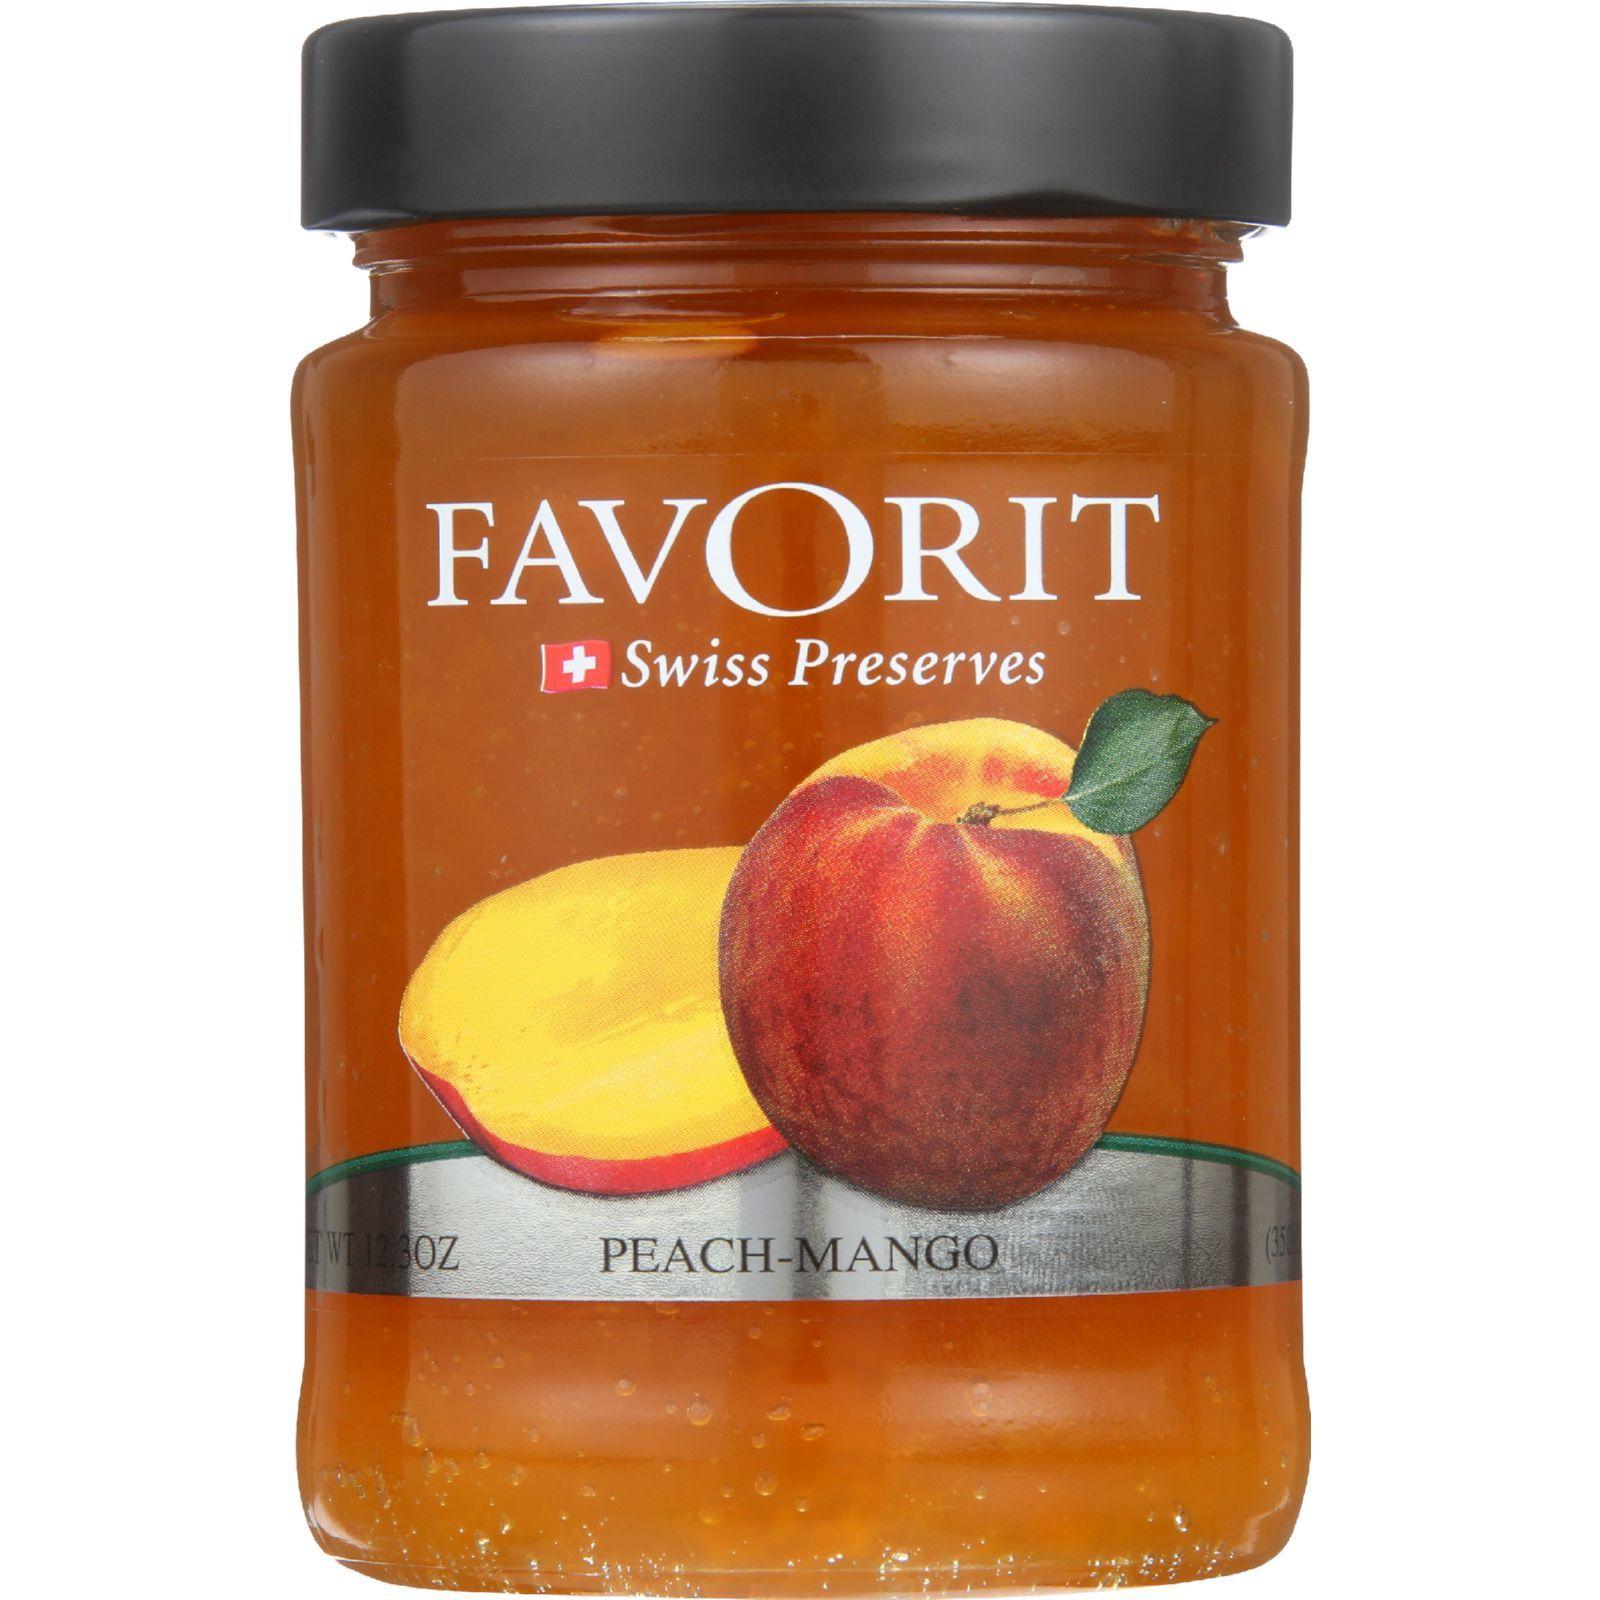 Favorit Preserves - Swiss - Peach-Mango - 12.3 oz - case of 6